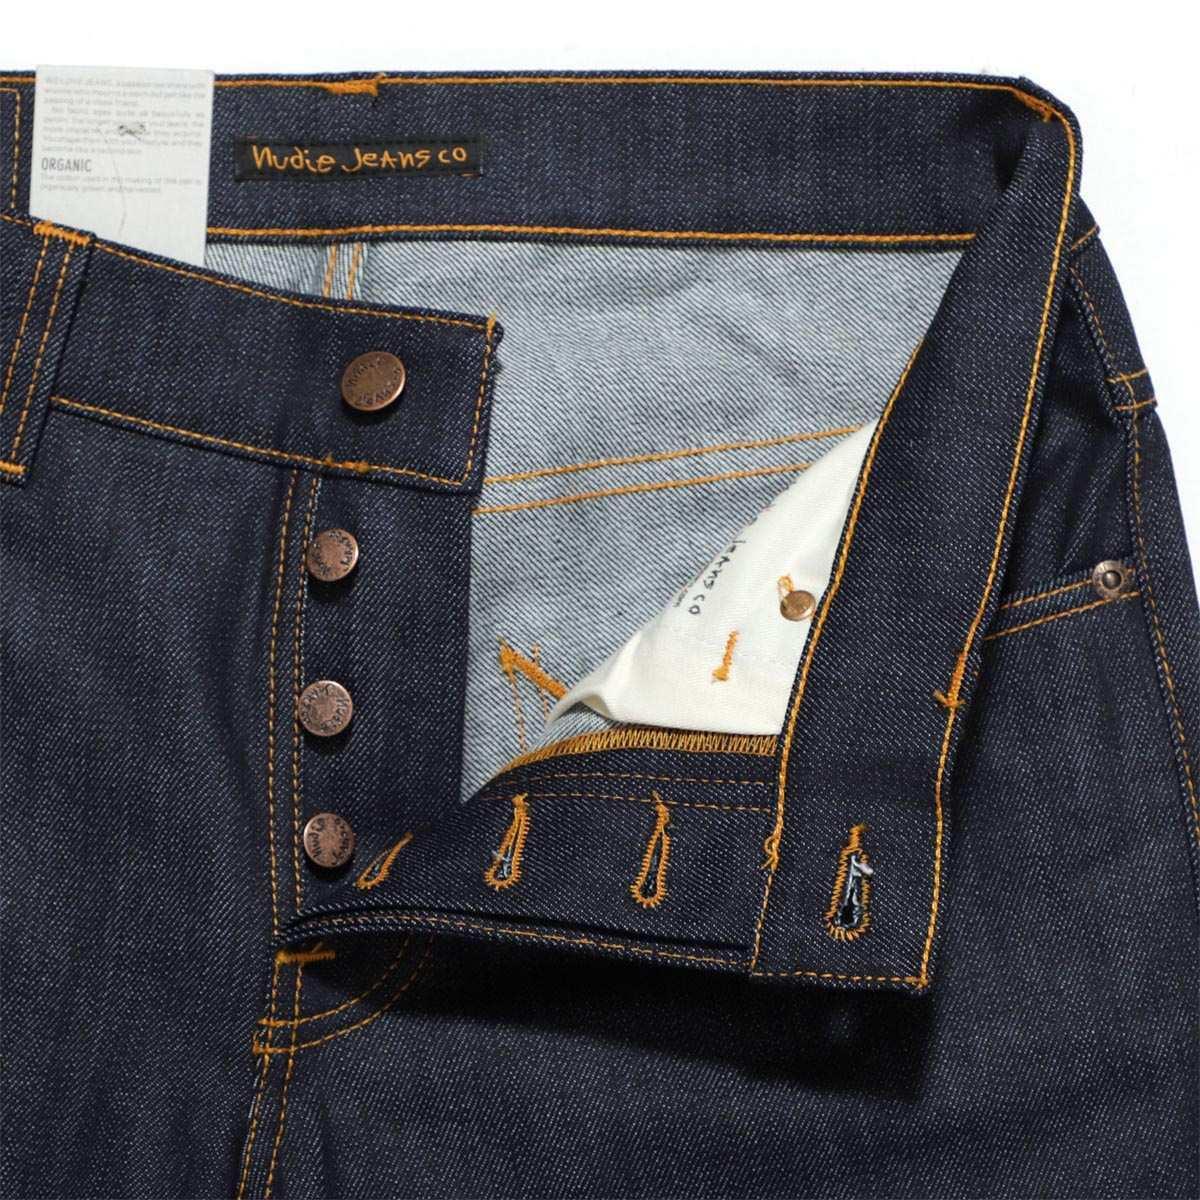 牛羚D牛仔裤nudie jeans co按钮油炸食品牛仔裤GRIM TIM SLIM REGULAR FIT DRY OPEN NAVY蓝色派grim tim 112223人